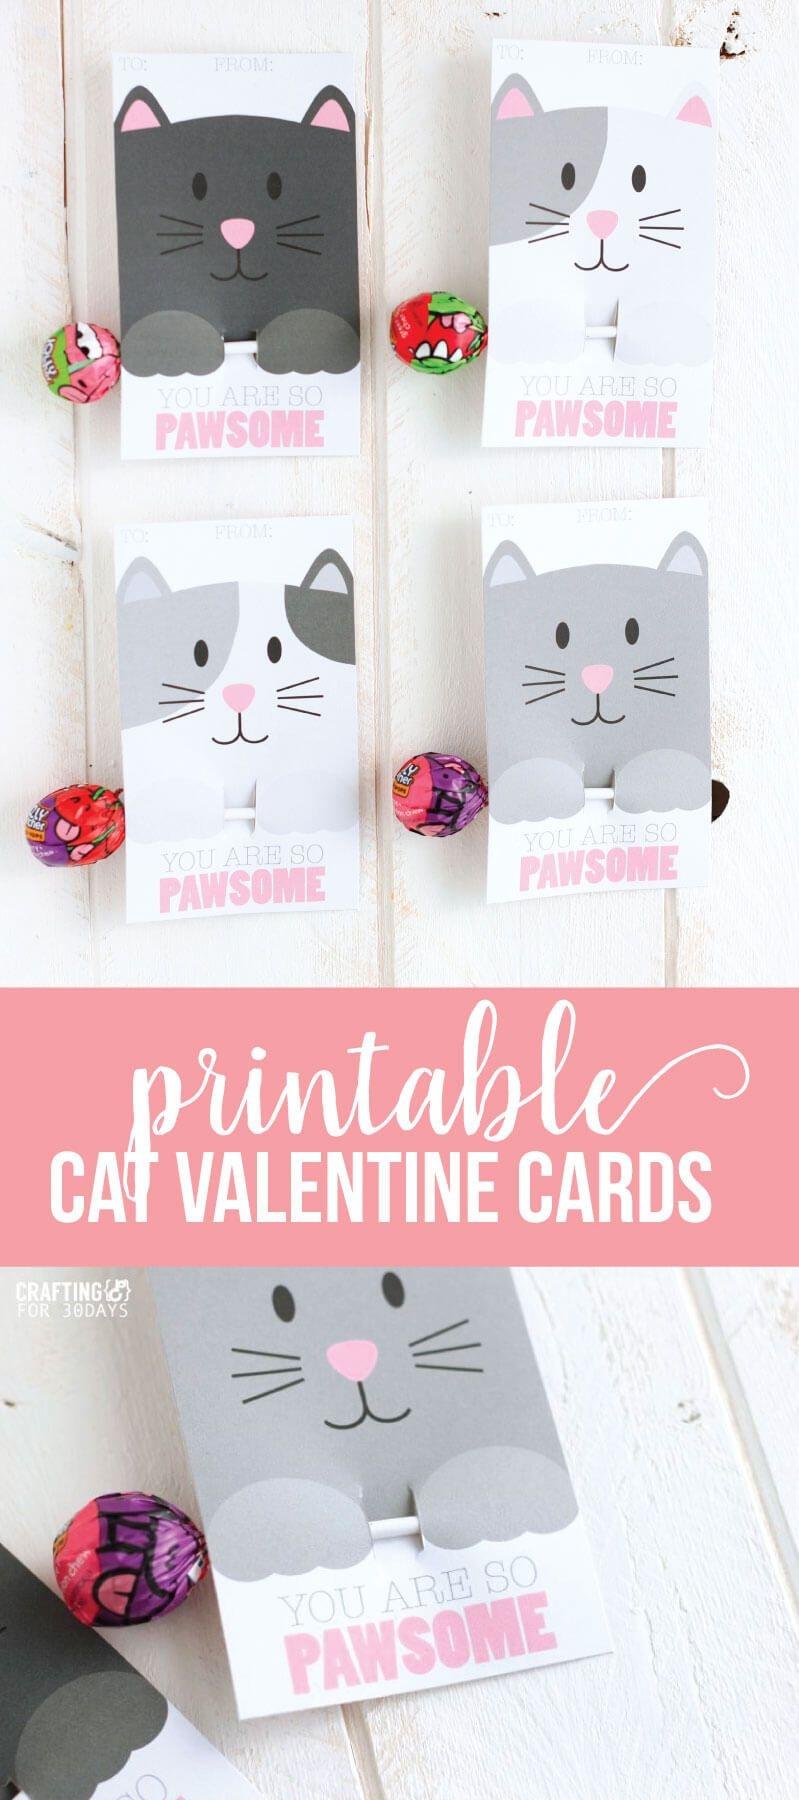 Printable Cat Valentine Day Cards | Valentine's Day Love | Diy - Free Printable Cat Valentine Cards